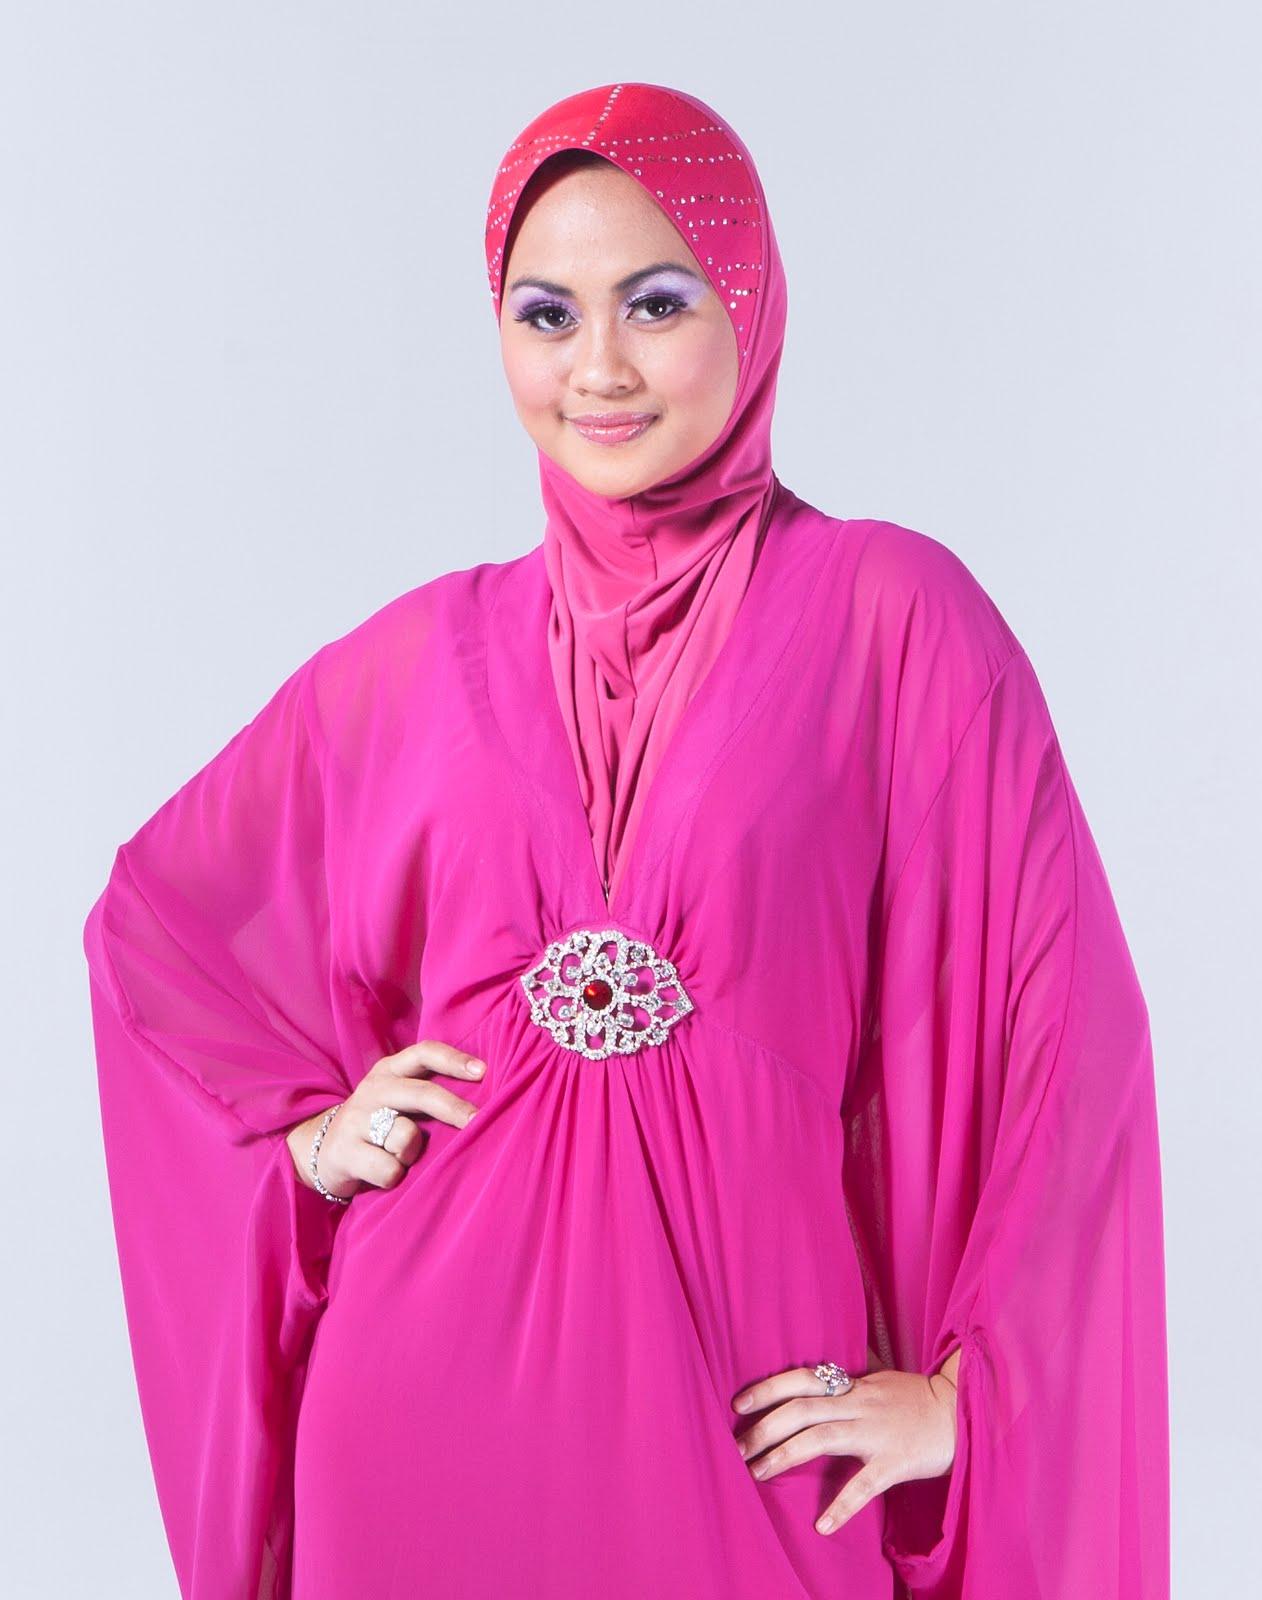 A R E N A F O T O S T U D I O Photoshoot Pakaian Muslimah